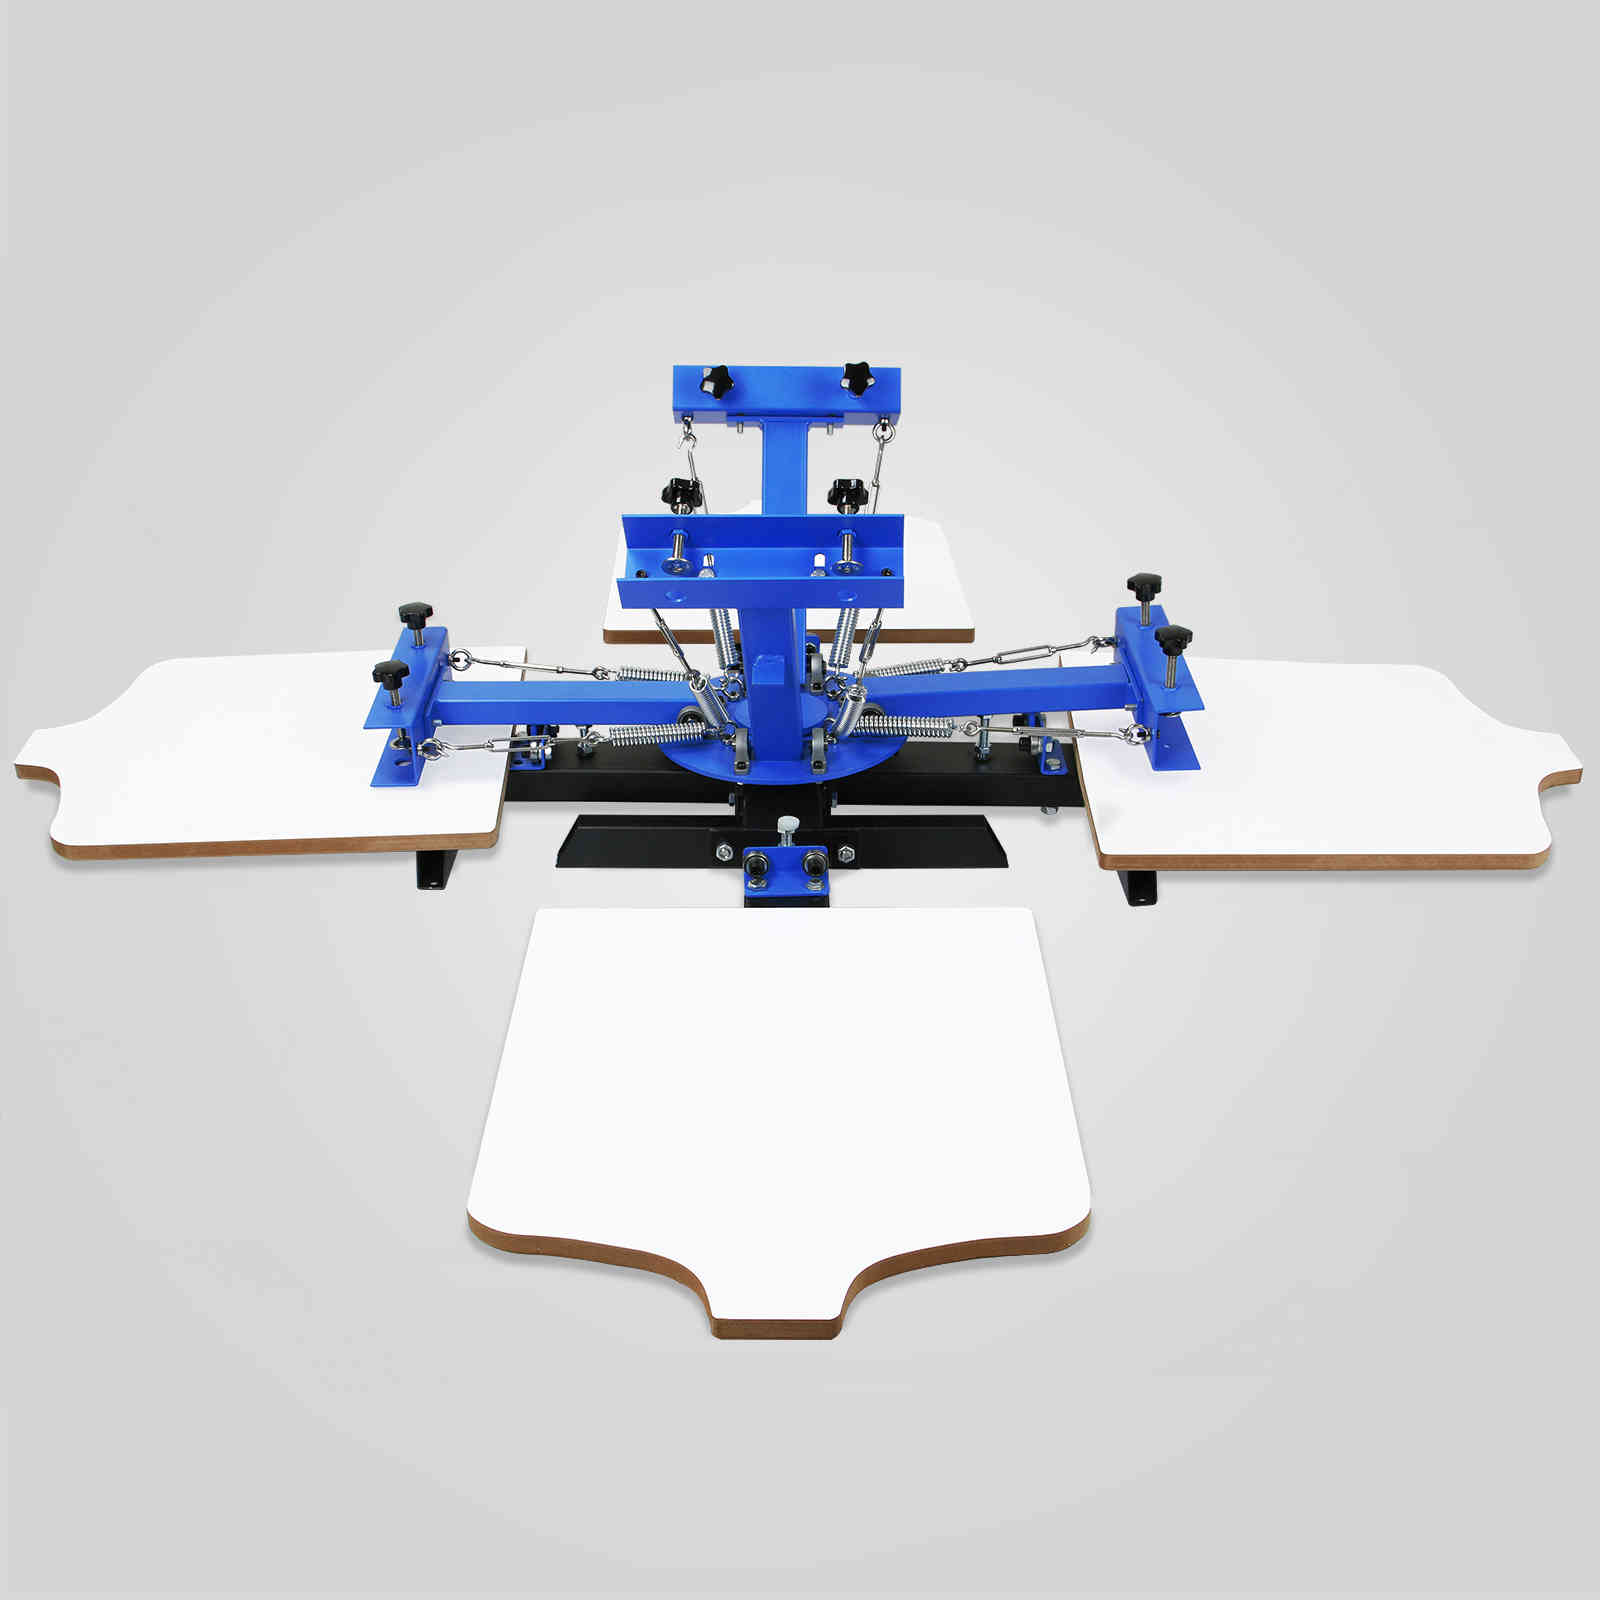 4 Color 4 Station Silk Screening Screenprint Press Screen Printing Machine  For T-Shirt DIY Printing Removable Pallet